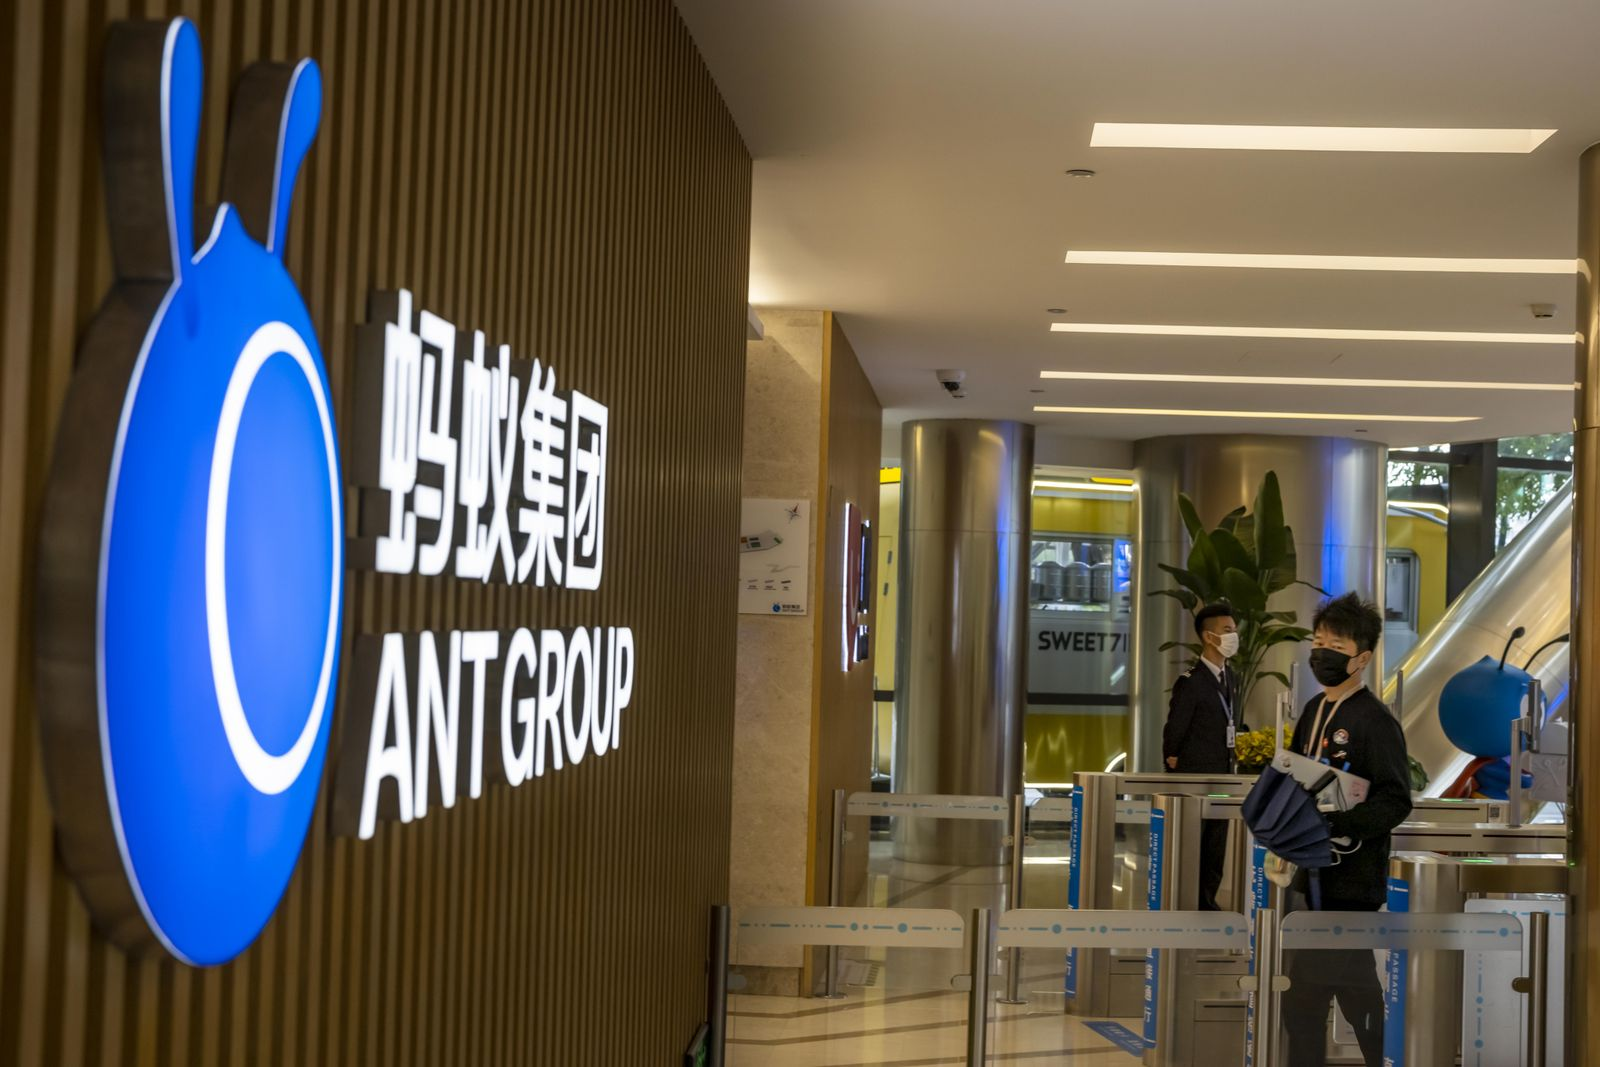 Ant Group IPO postponed, Hangzhou, China - 27 Sep 2020